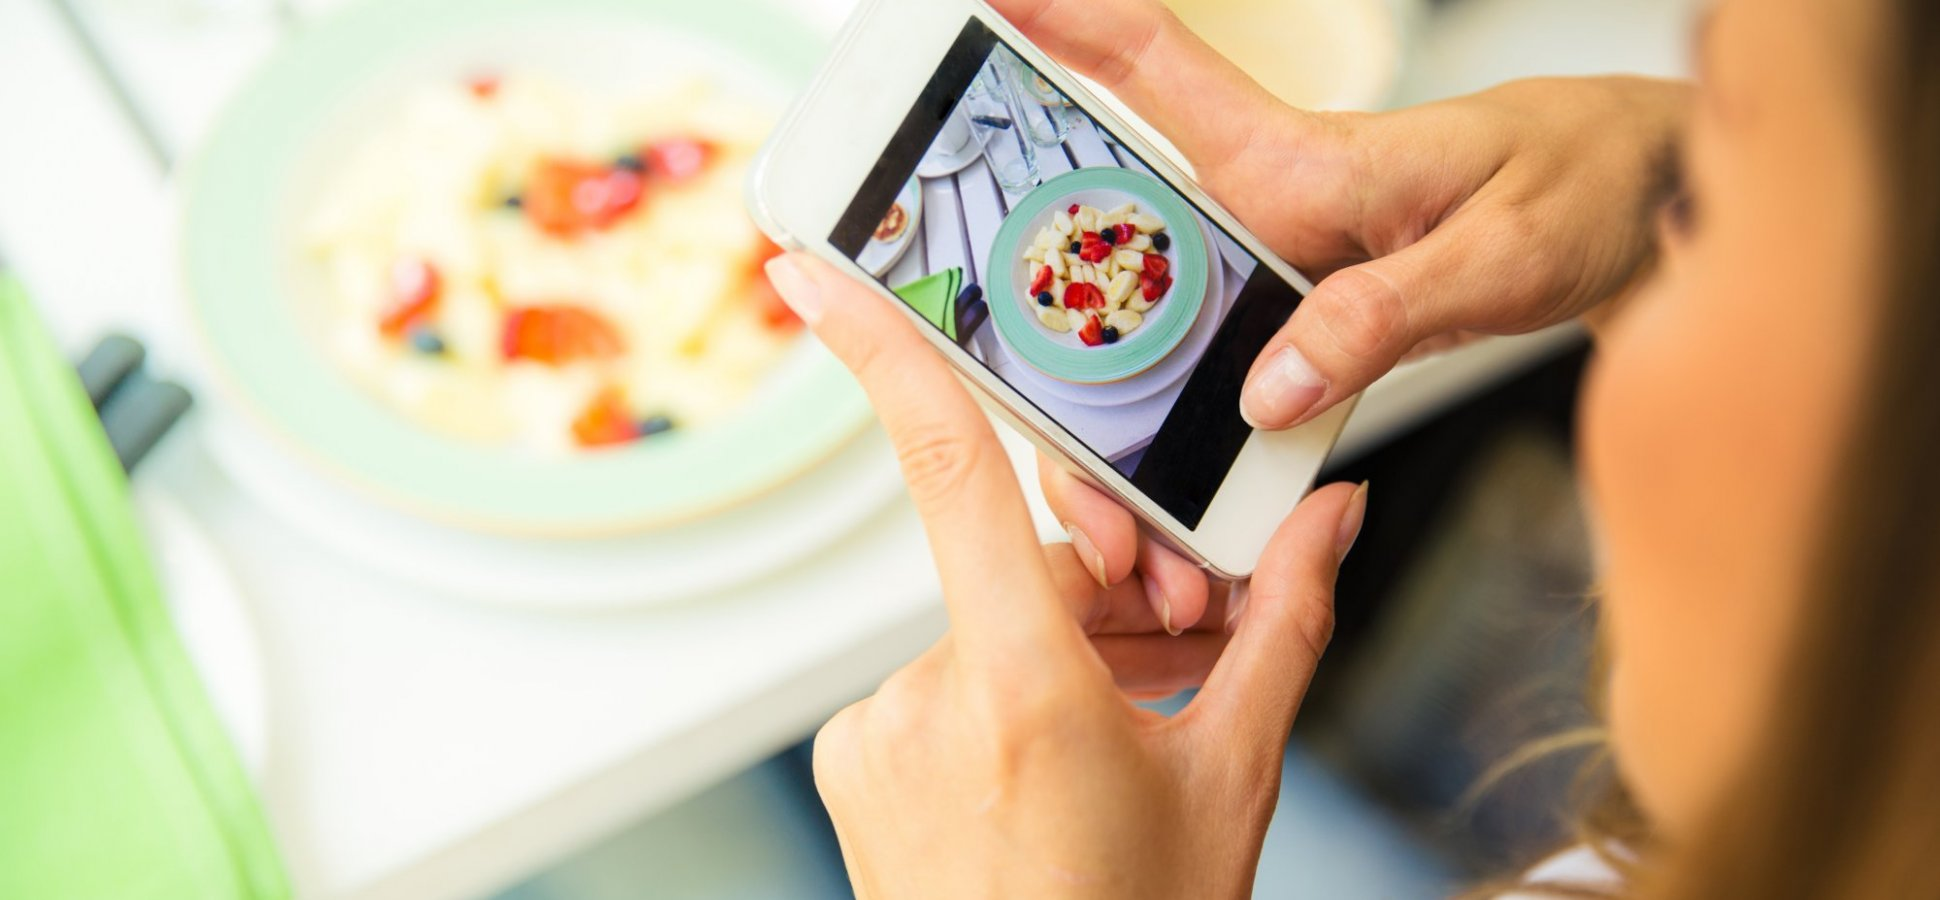 Instagram Introduces Warning System and Appeal Process For Platform Violators